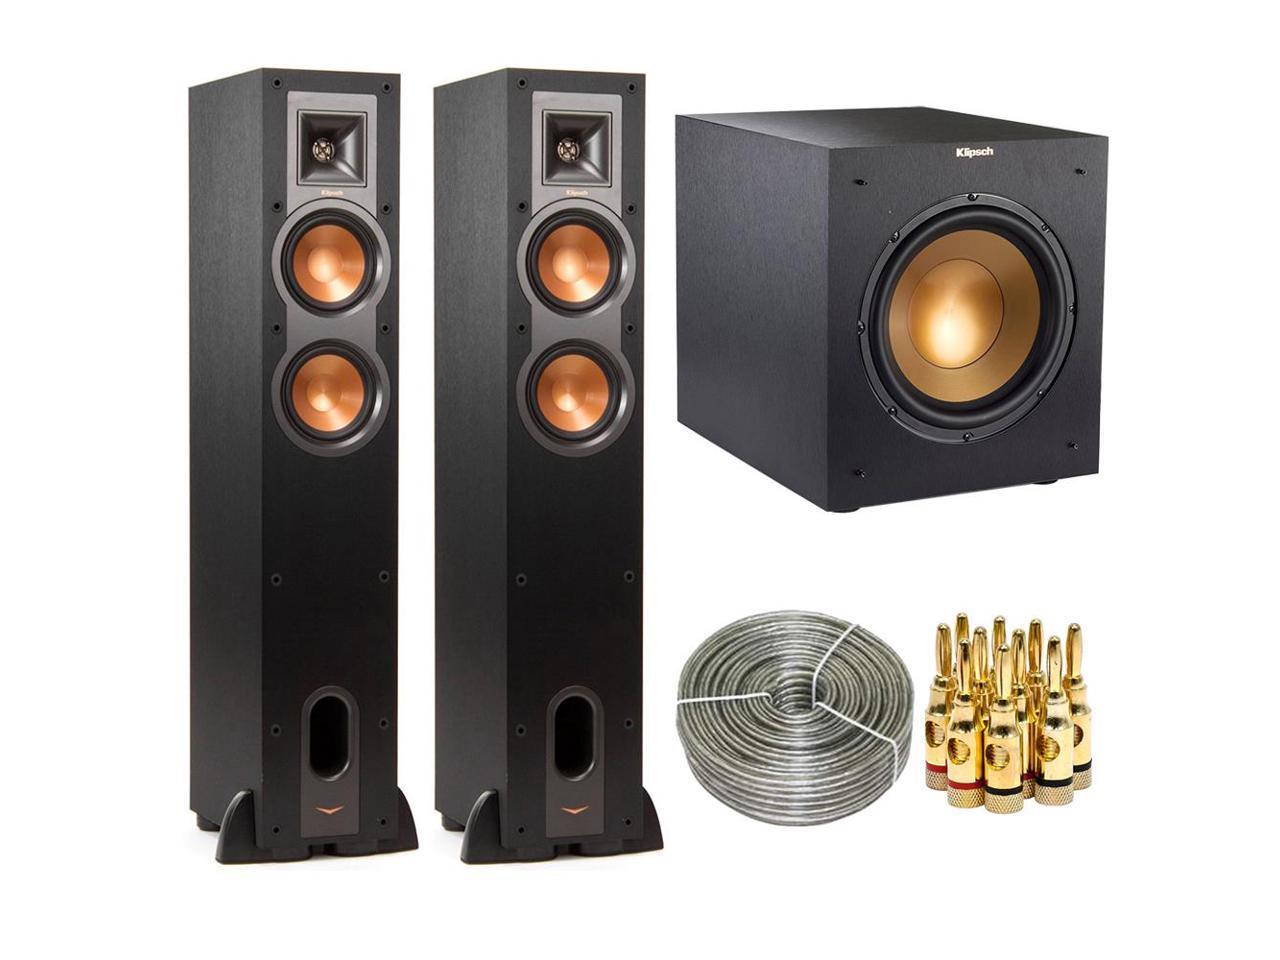 Klipsch Pair of R-24F Floorstanding Speaker w/ R-10SWi 10-inch 300w Wireless Subwoofer